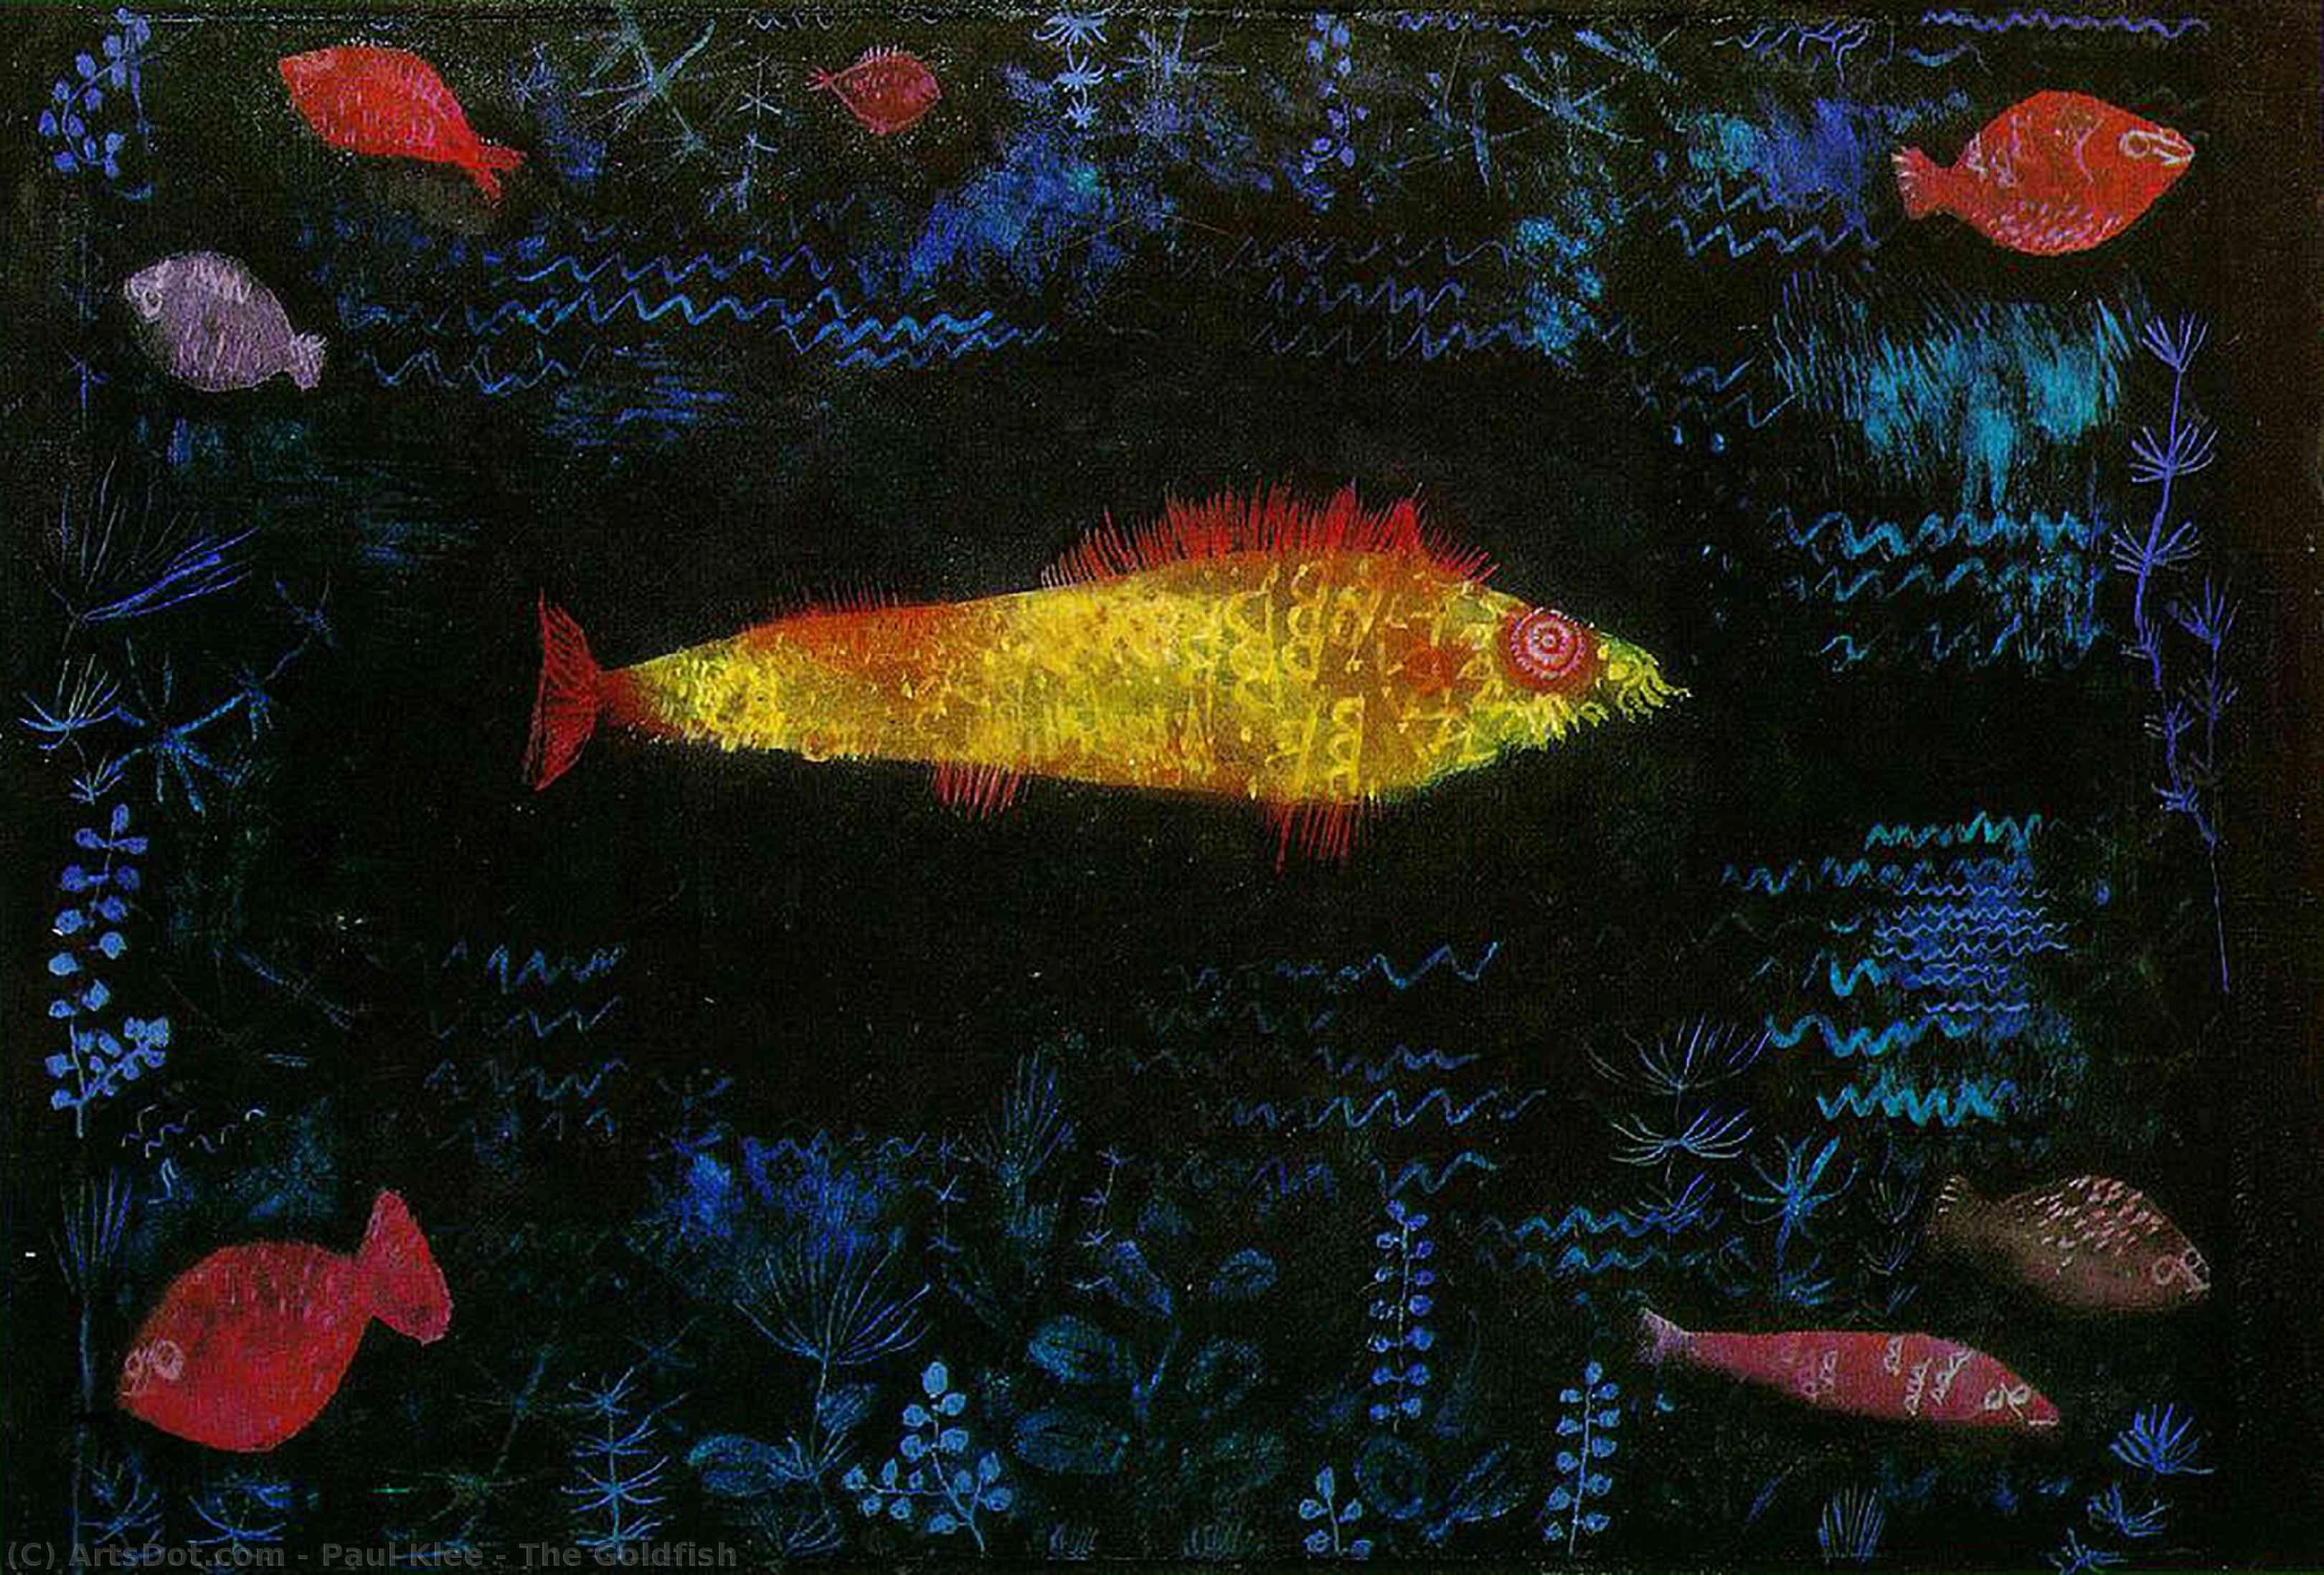 Wikoo.org - موسوعة الفنون الجميلة - اللوحة، العمل الفني Paul Klee - The Goldfish